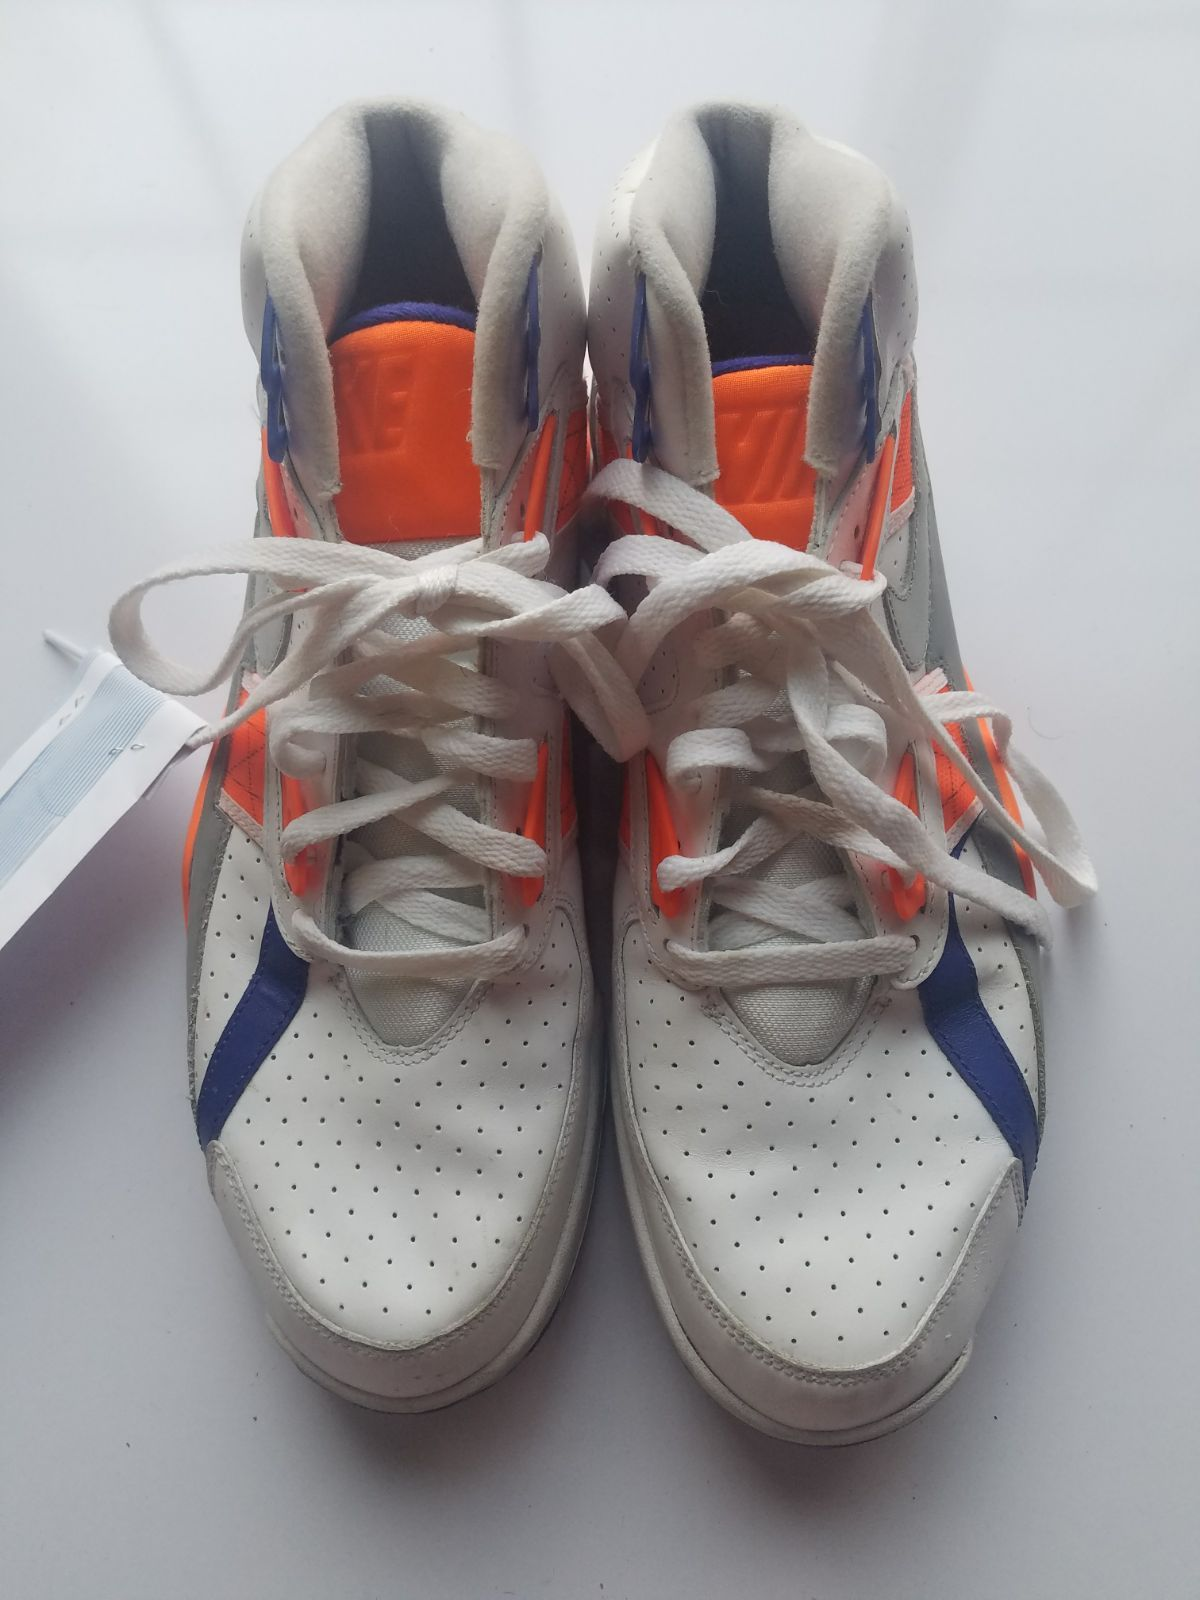 Nike Air Bo Jackson Trainer Sneaker 10.5